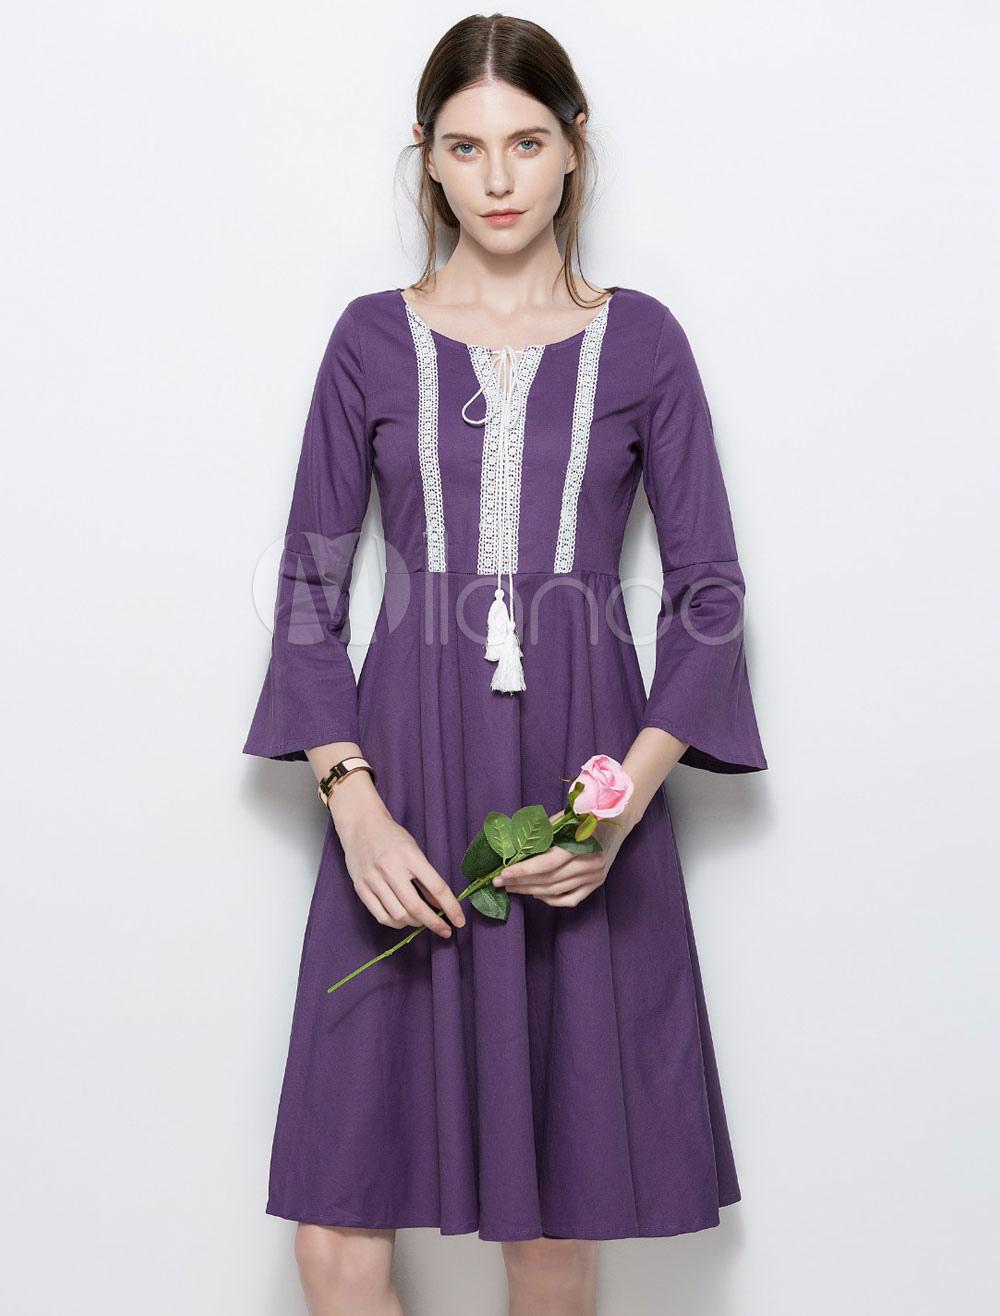 Cotton Skater Dress Purple Tassels Round Neck 3 4 Length Flared ... 56f9a1797